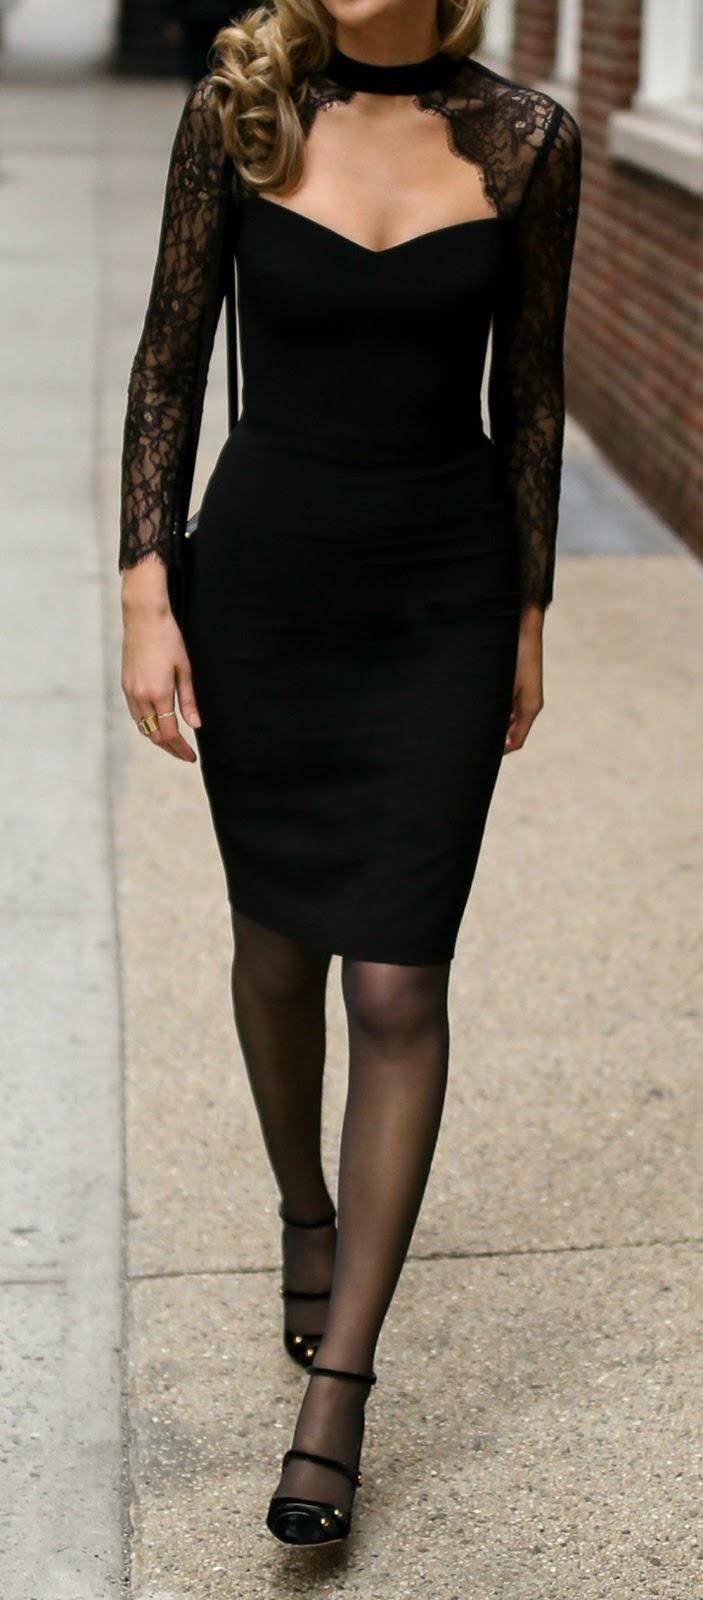 all black everything / bodycon dress + bag + tights + heels